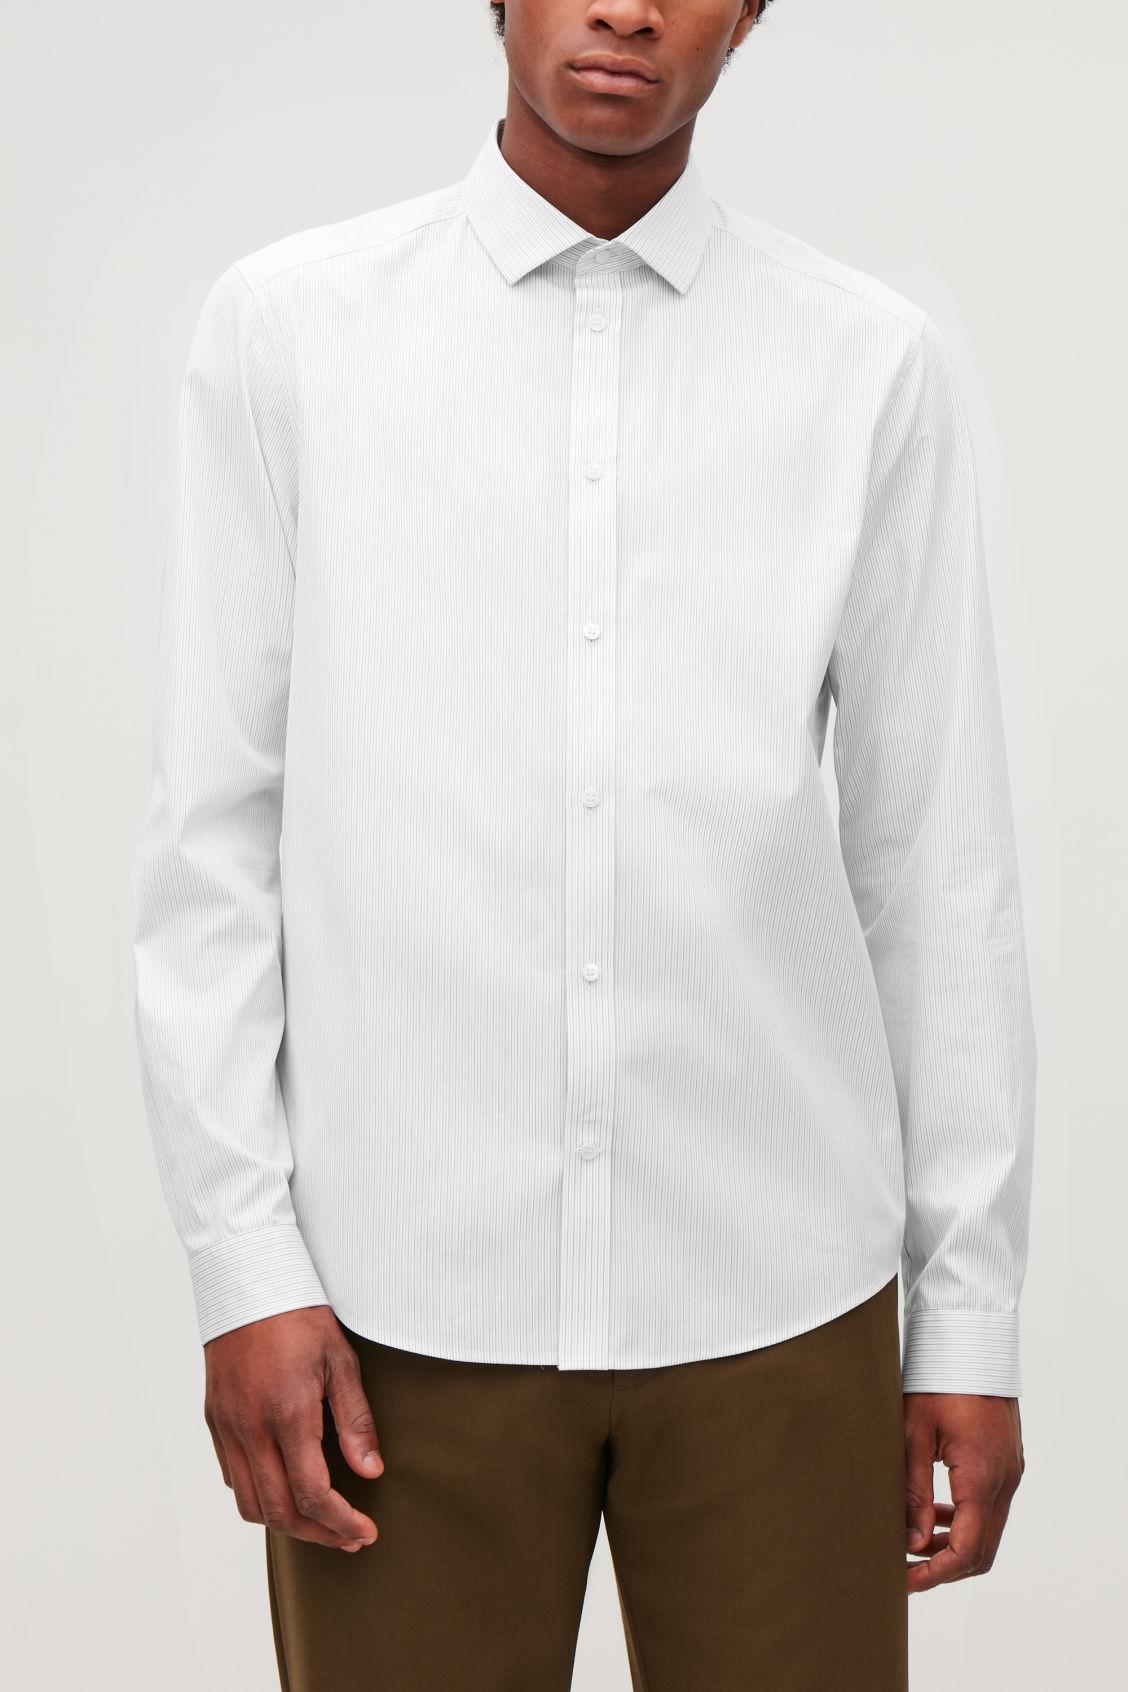 Striped Cutaway Collar Shirt White Grey Shirts Cos